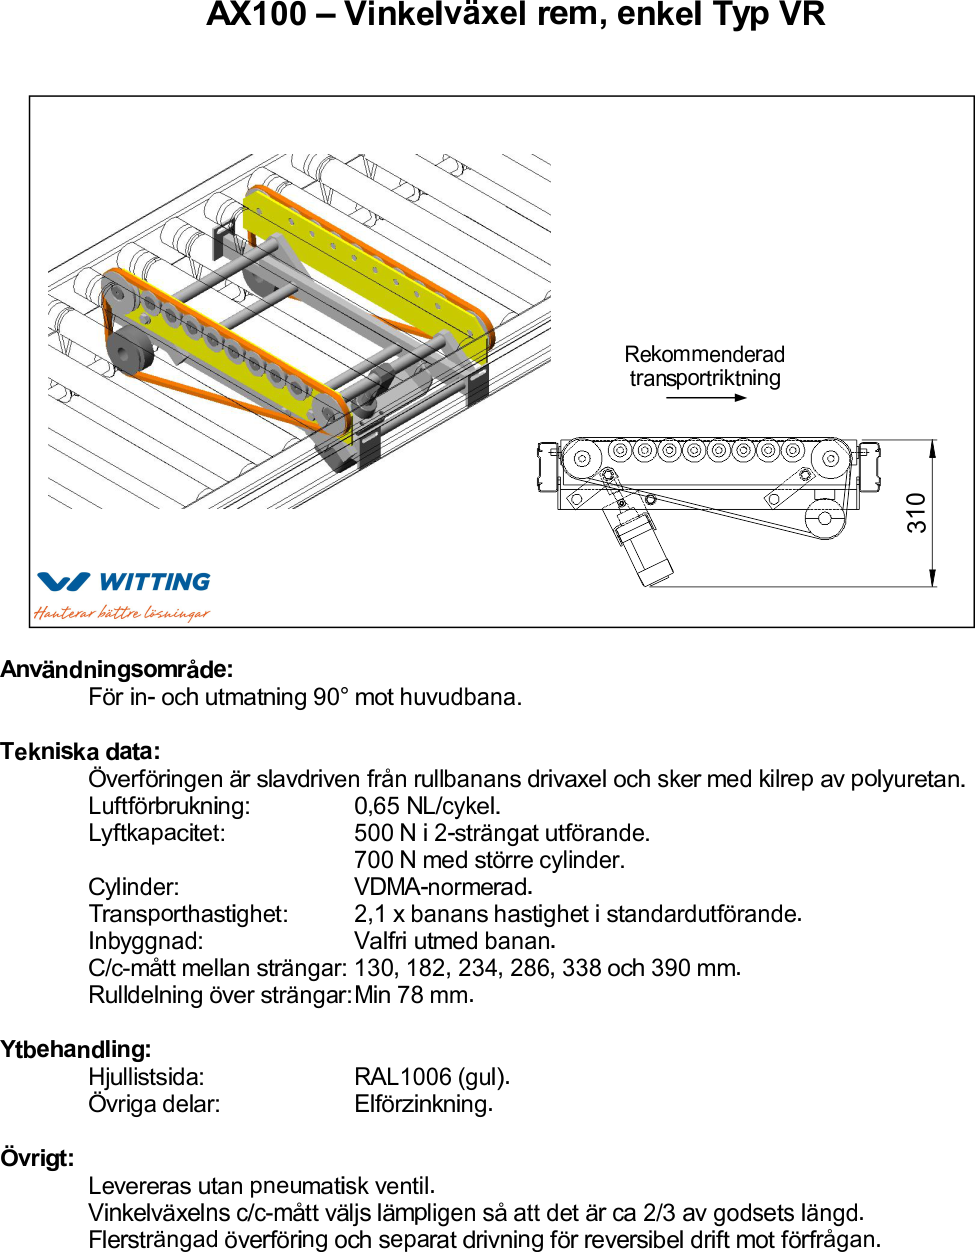 AX100 – Vinkelväxel kedja, enkel Typ VR